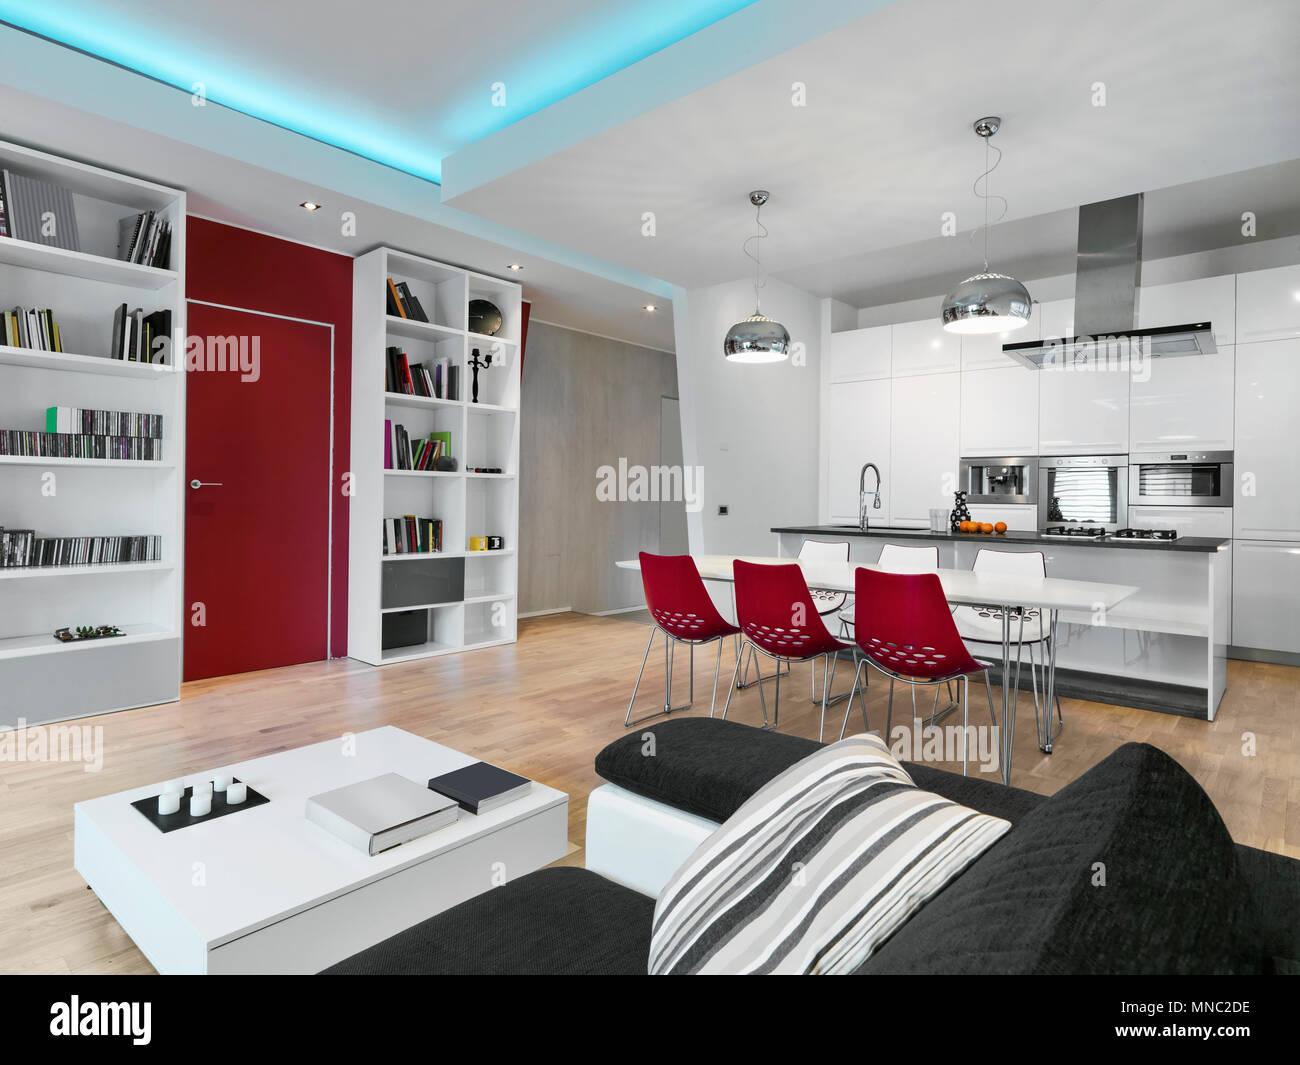 Fotograf as de interiores de una moderna sala de estar con for Mesa de comedor en la sala de estar